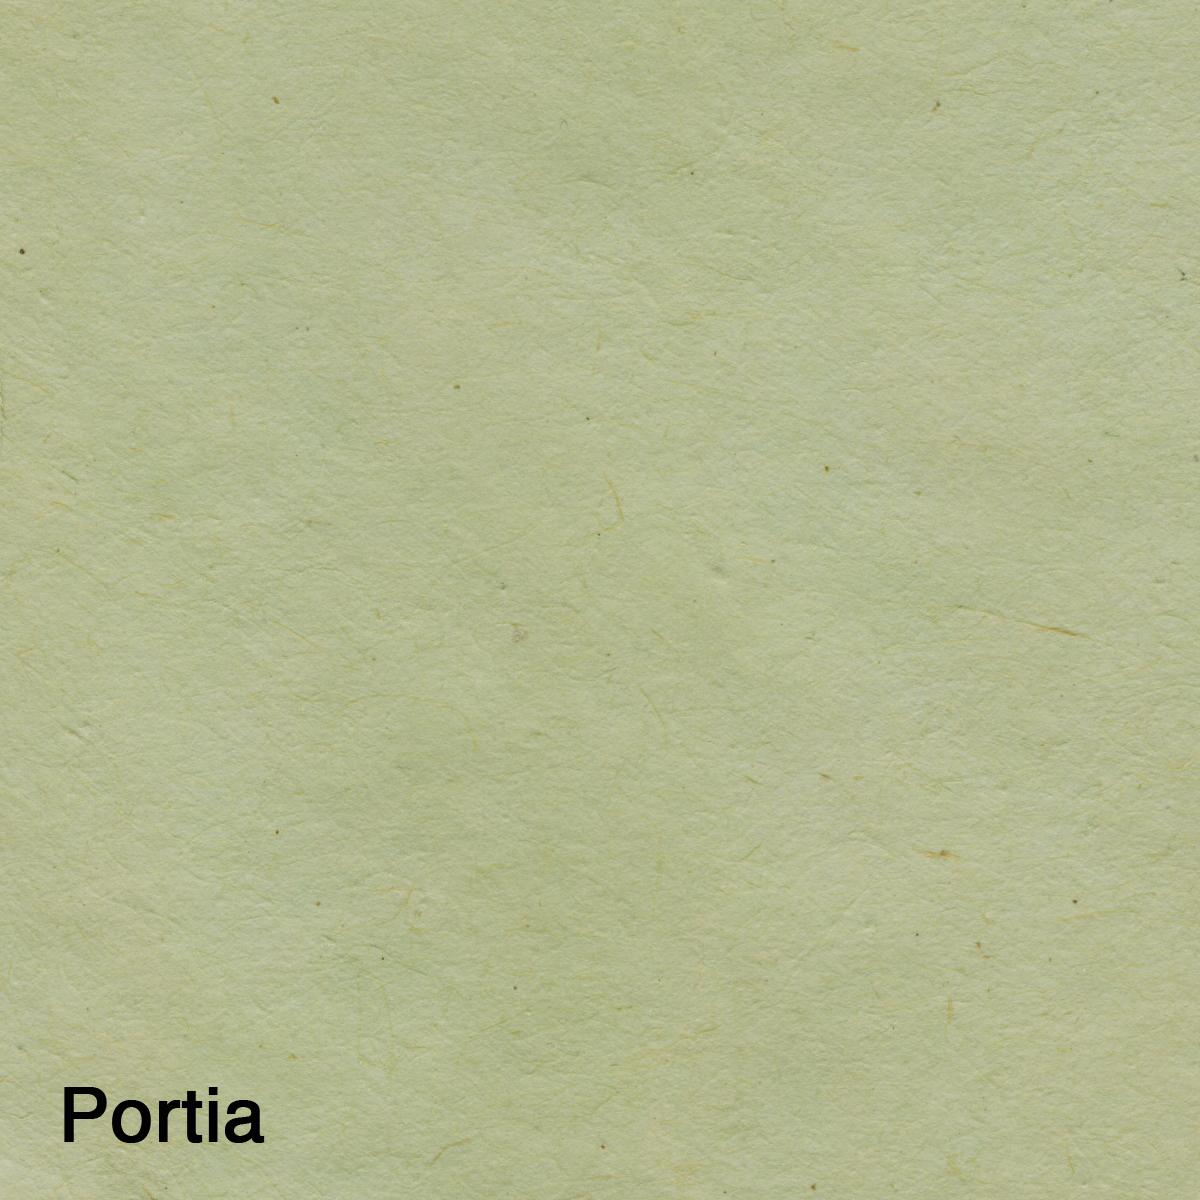 Portia-2.jpg